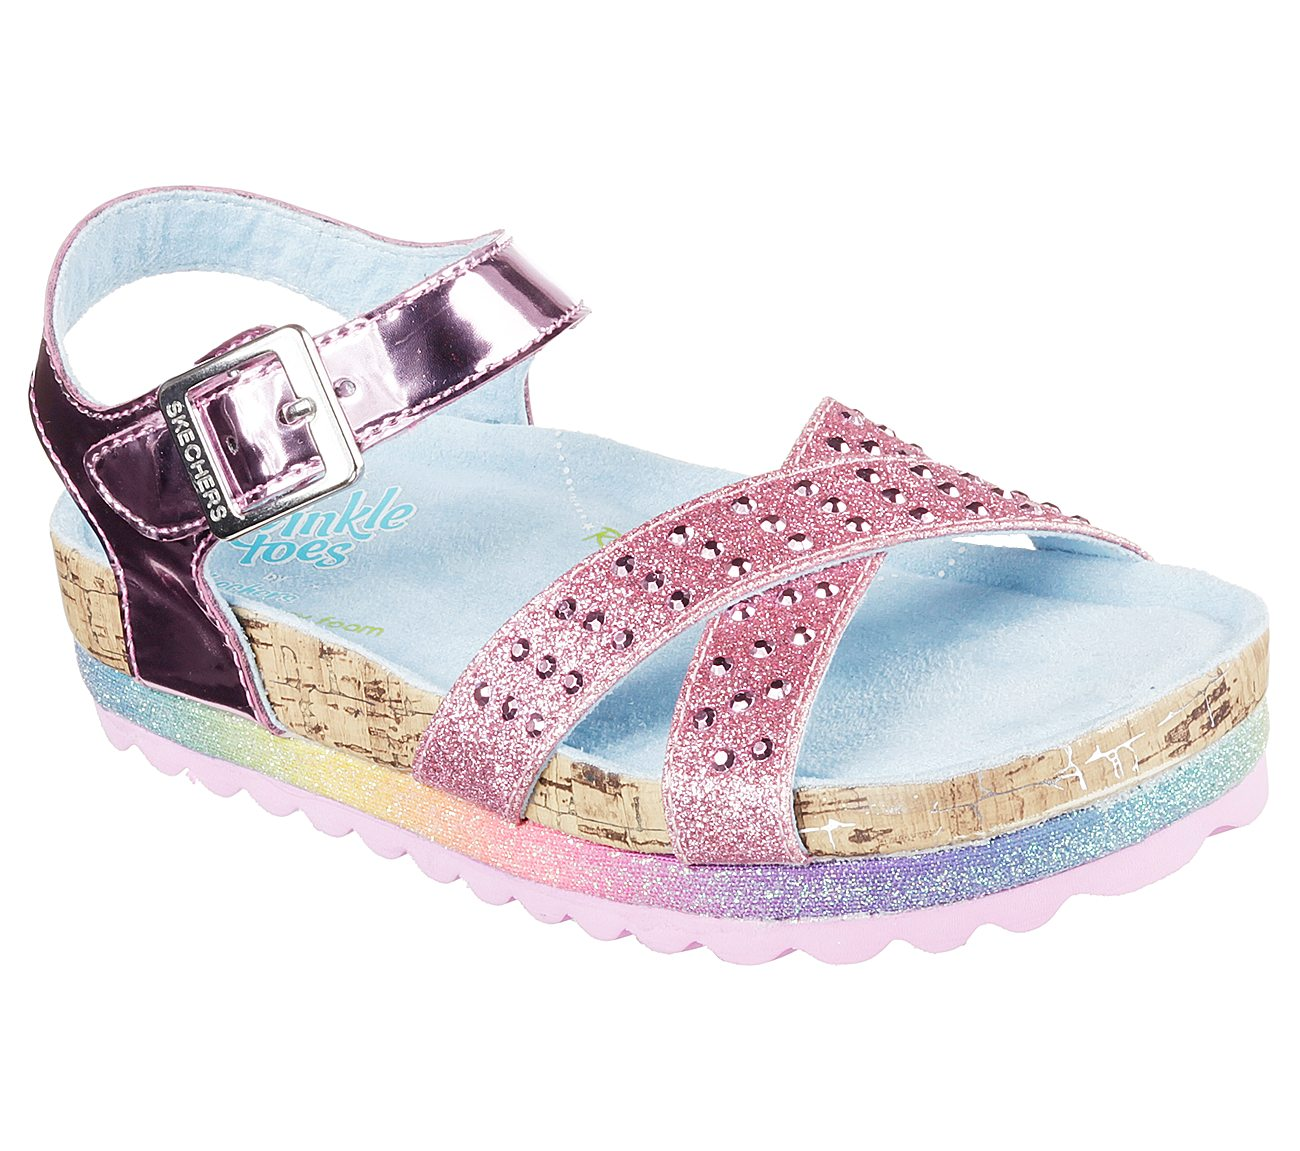 Buy SKECHERS Twinkle Toes: Granola II